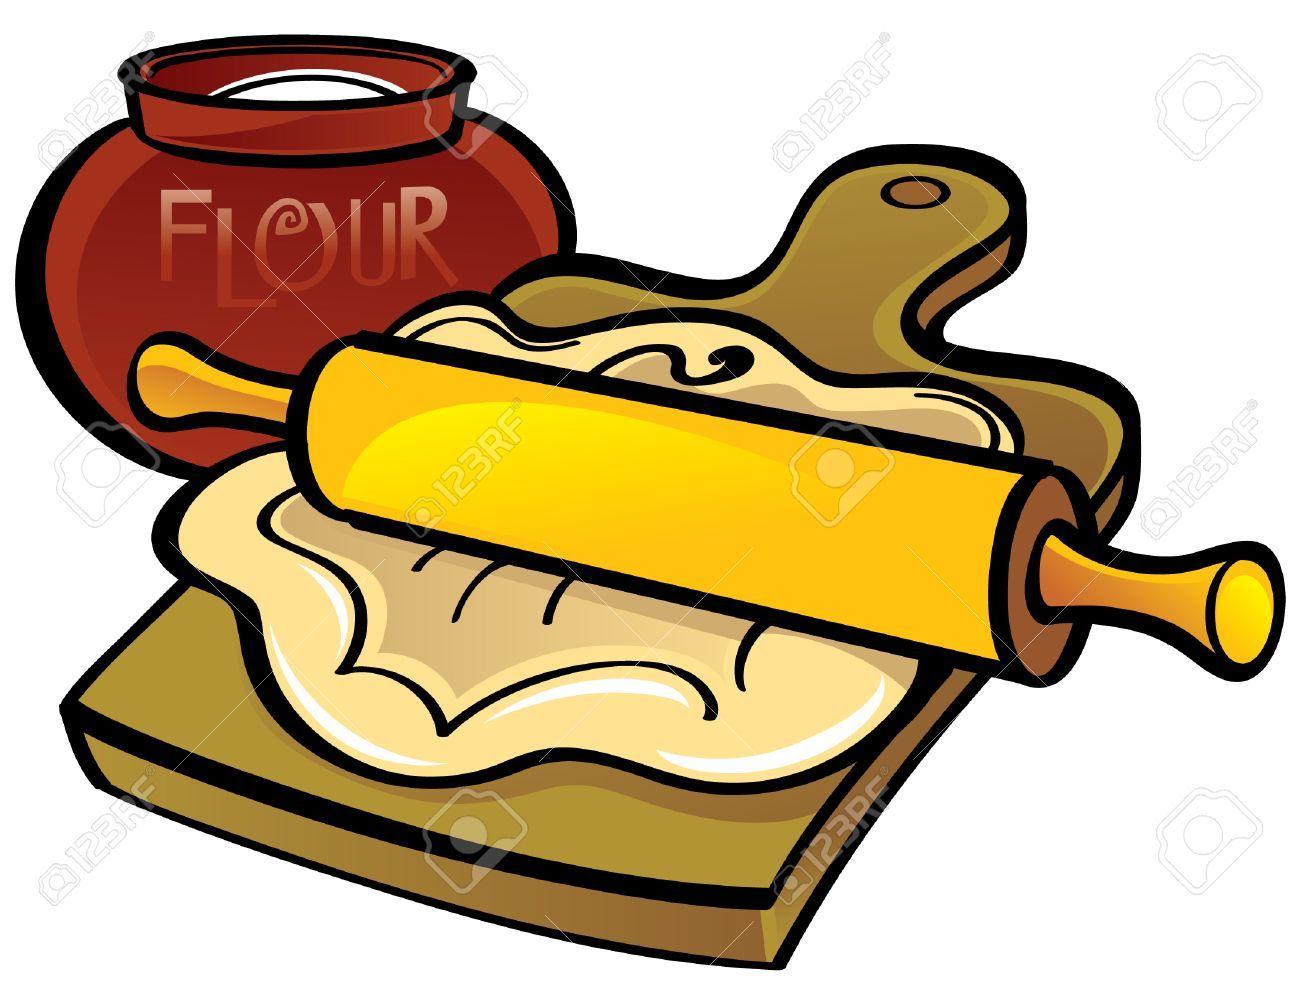 Rolling dough clipart 8 » Clipart Portal.